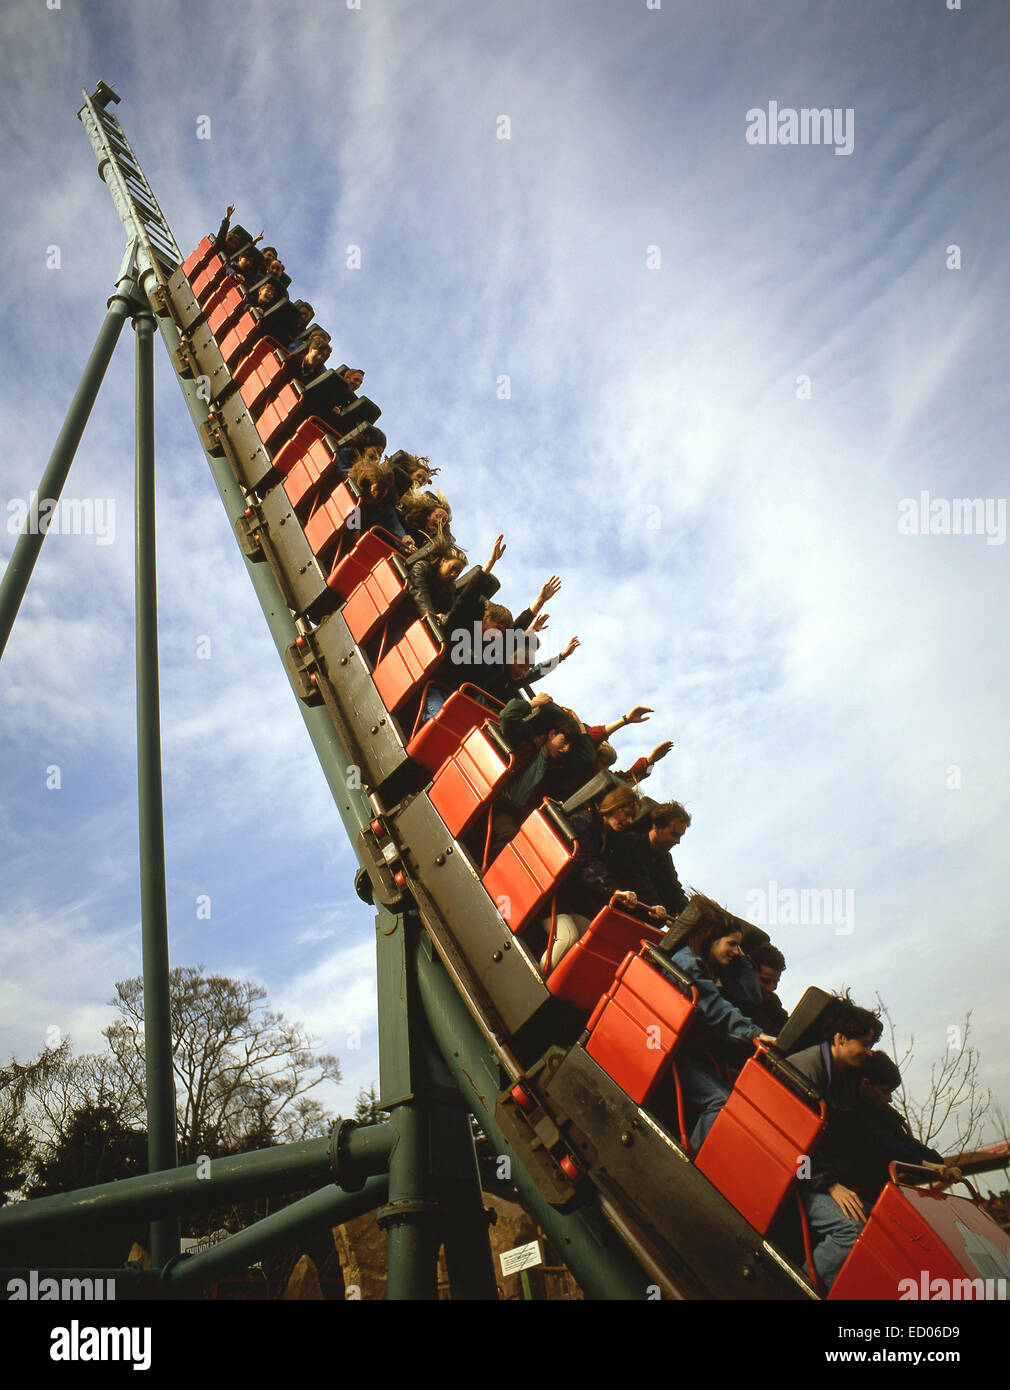 'Thunder Looper' rollercoaster ride at Alton Towers Theme Park, Alton, Staffordshire, England, United Kingdom - Stock Image